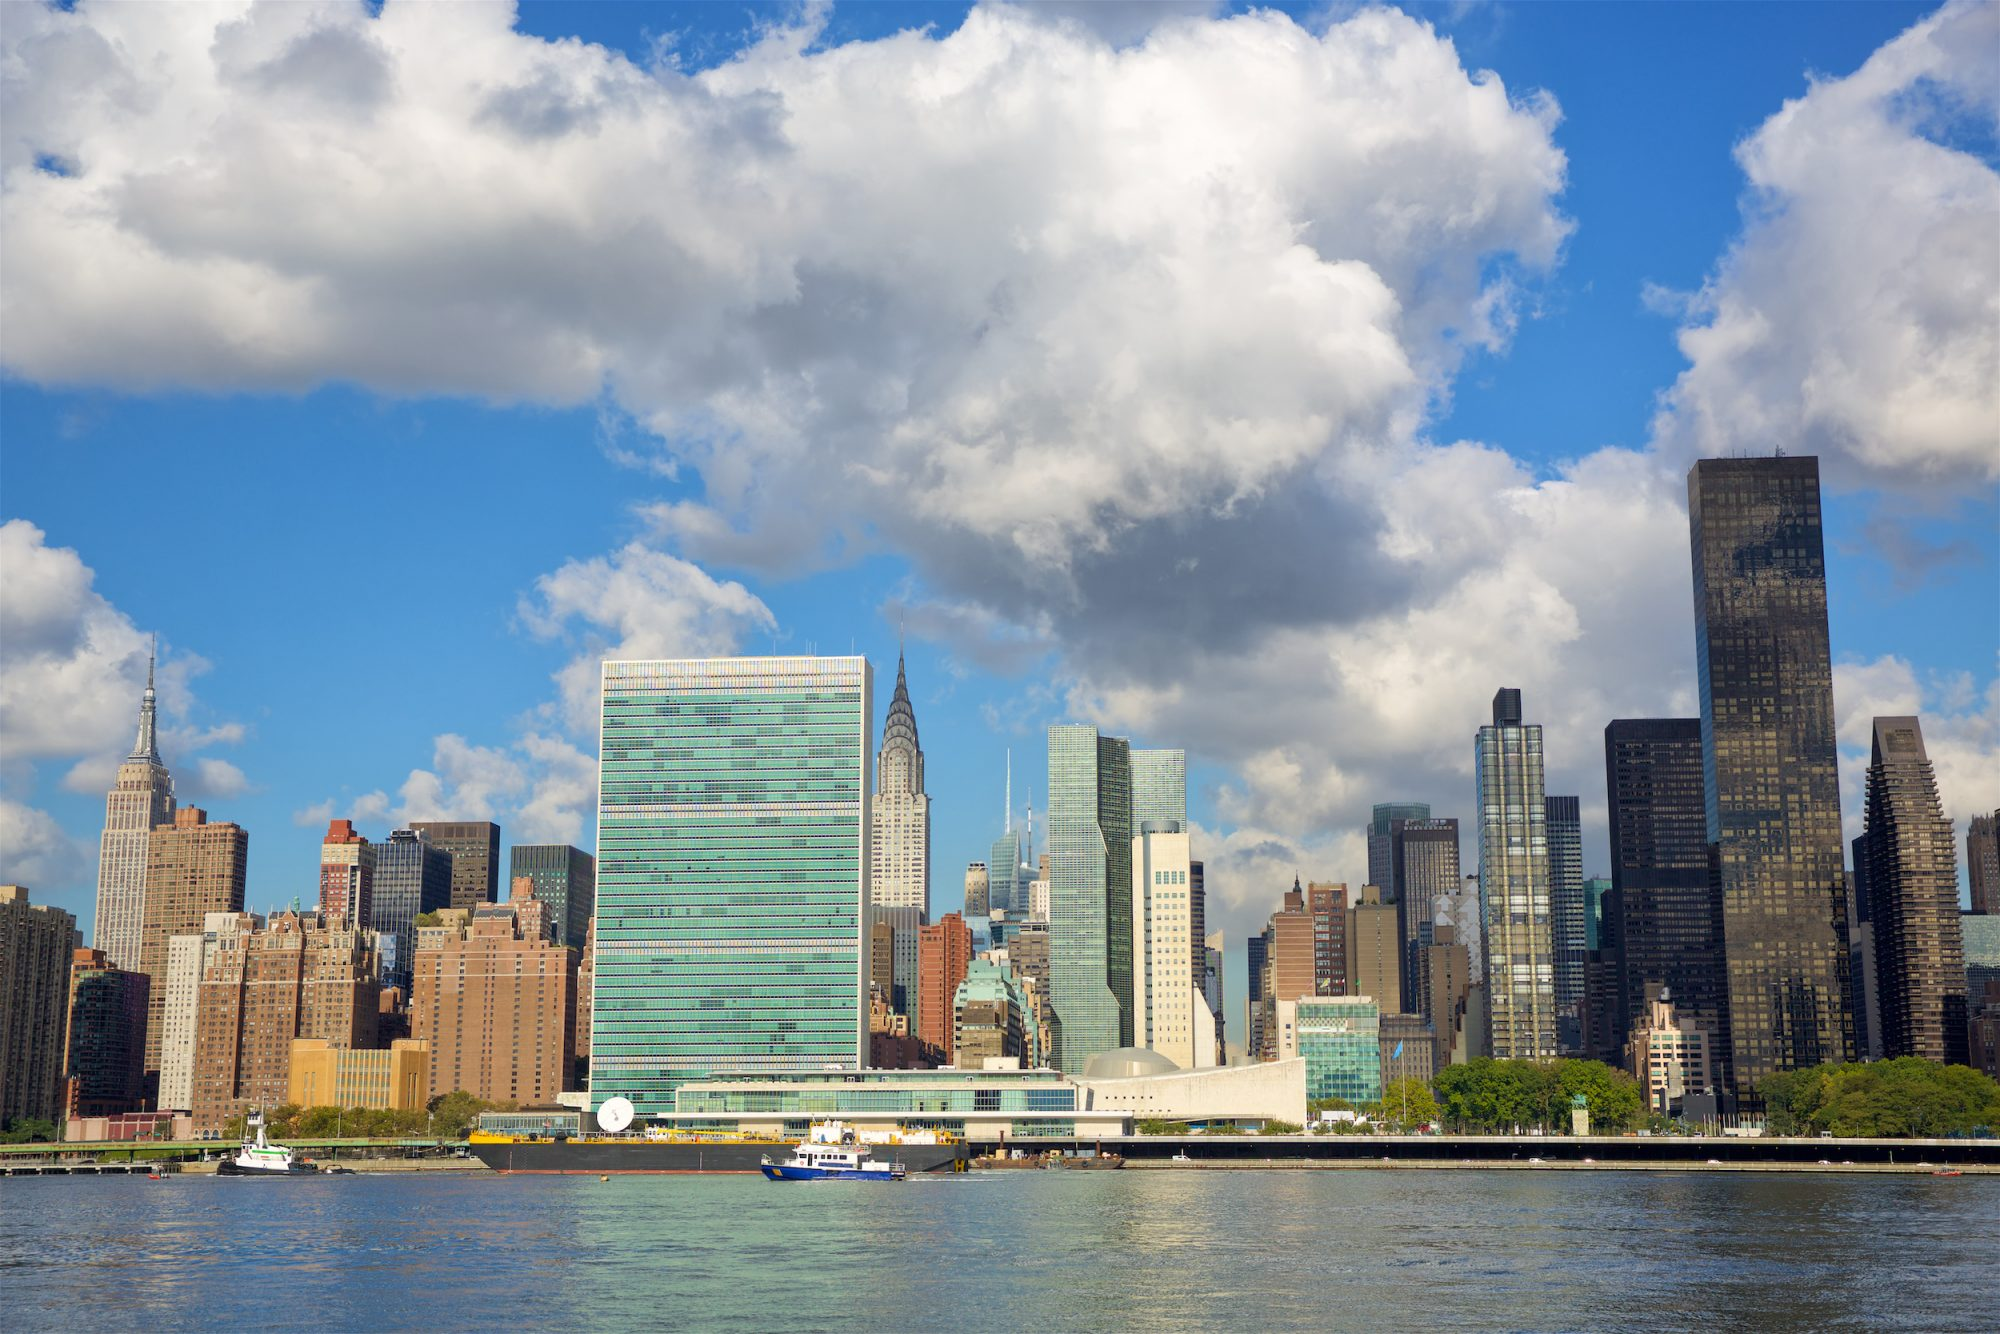 Qatar, UN Sign Agreement to Establish UNOCT Program Office in Doha